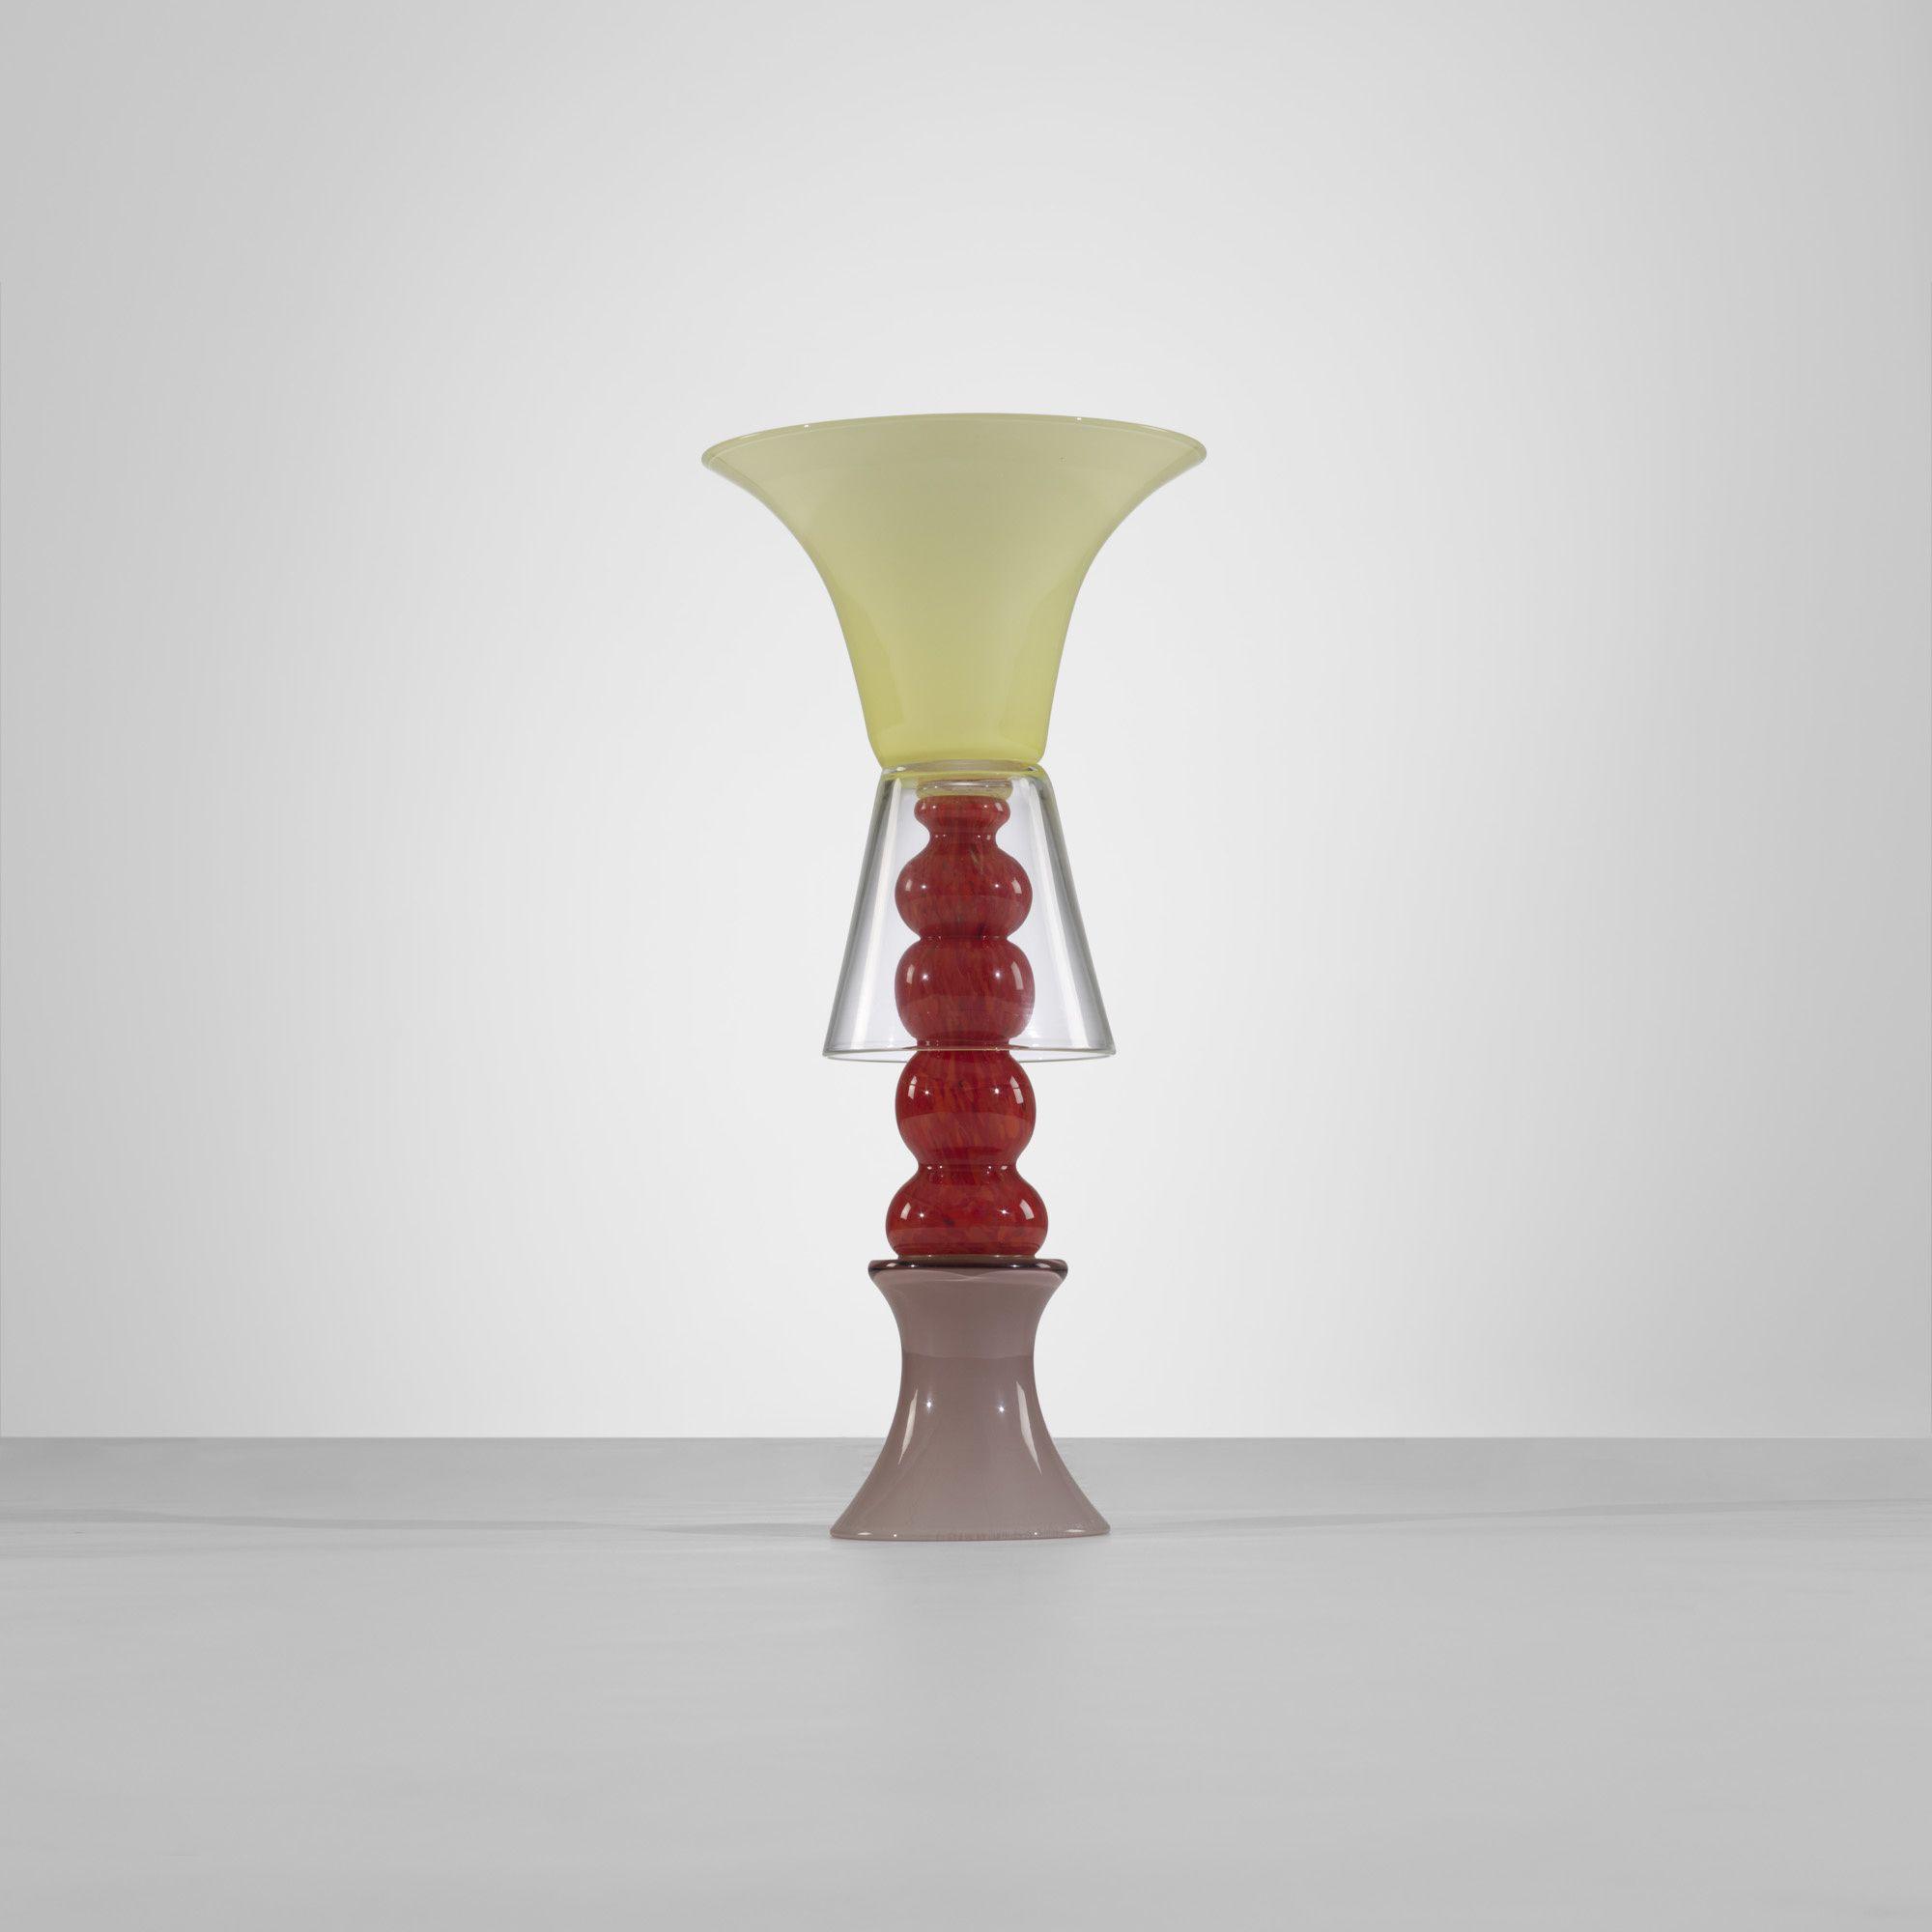 14 Ideal Ettore sottsass Vase 2021 free download ettore sottsass vase of ettore sottsass eloride vase d ettore sottsass pinterest throughout ettore sottsass eloride vase